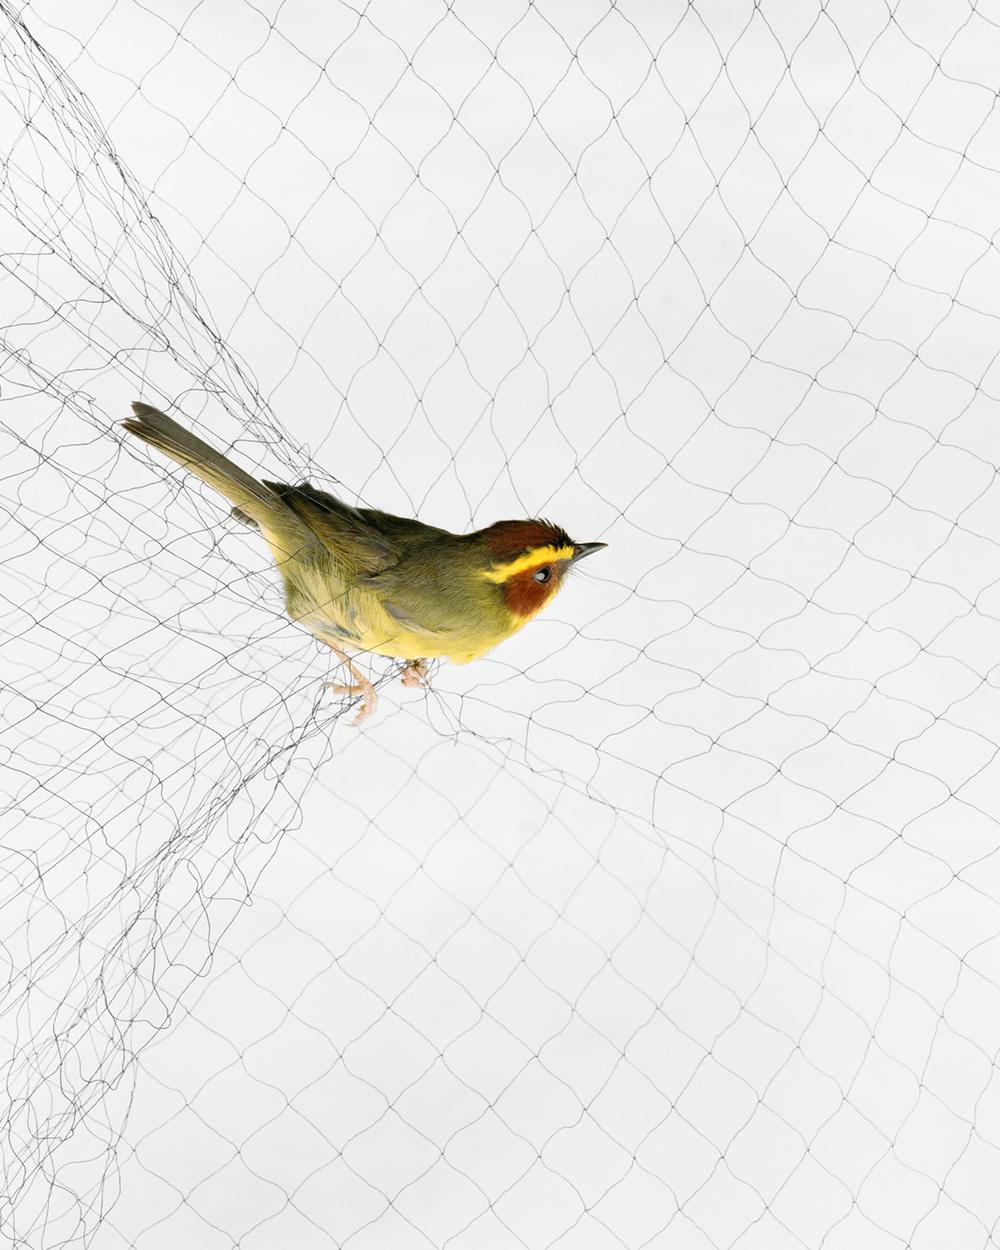 Golden-browed Warbler (Basileuterus belli), 2014 ,  Todd R. Forsgren